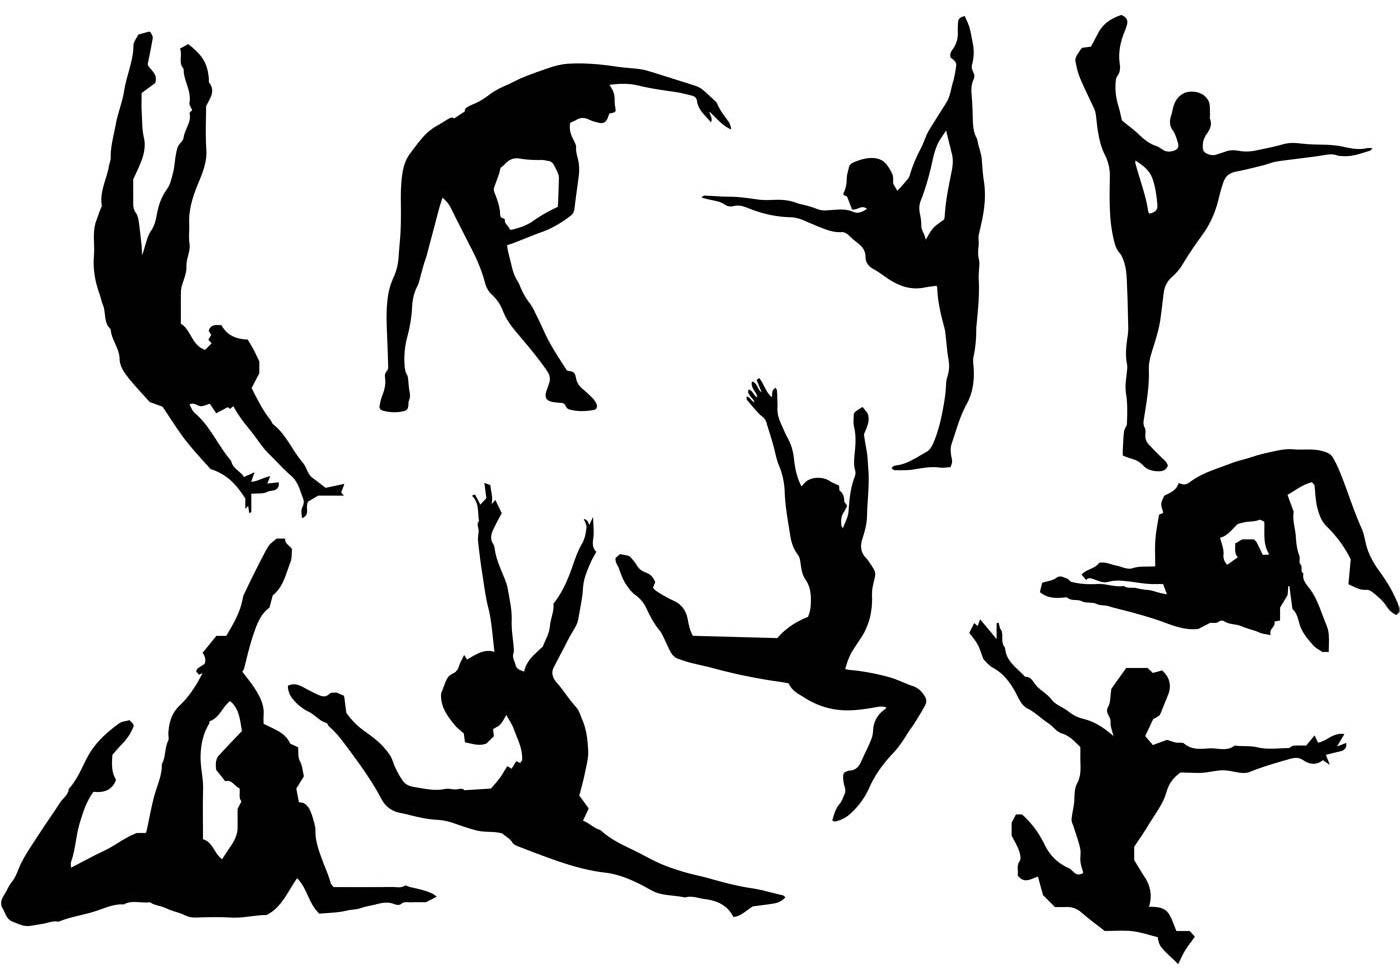 Free Gymnastics Silhouette Vector